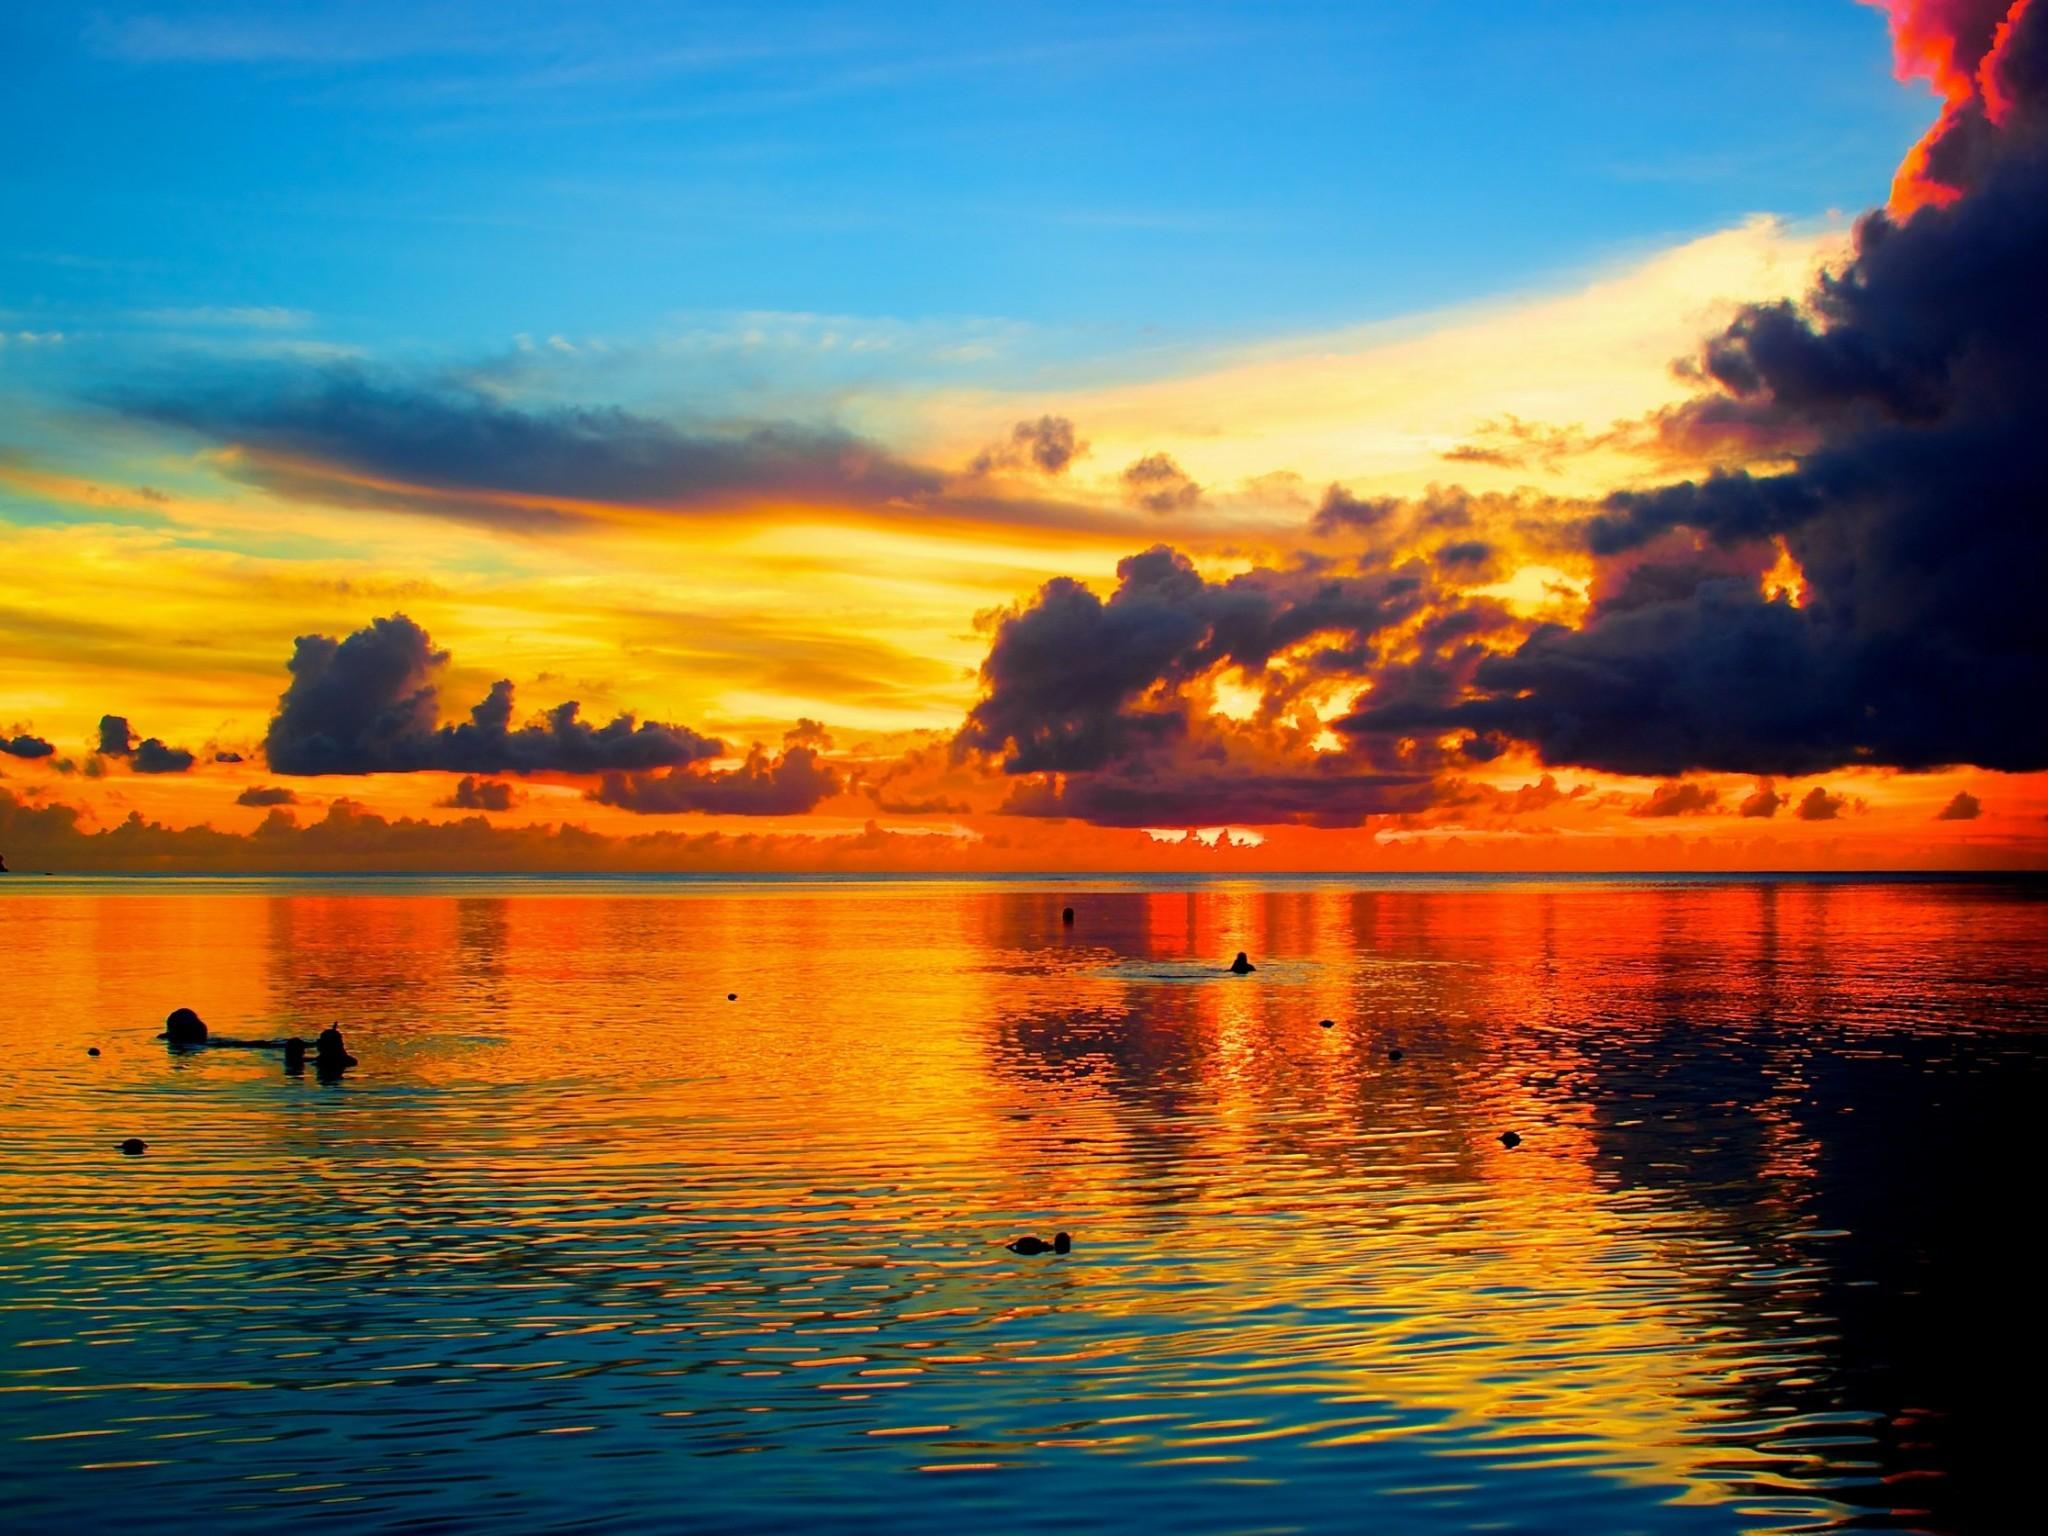 Ocean Sunset Palm Trees | Sea Sunset Palm Tree Guam hd Wallpaper